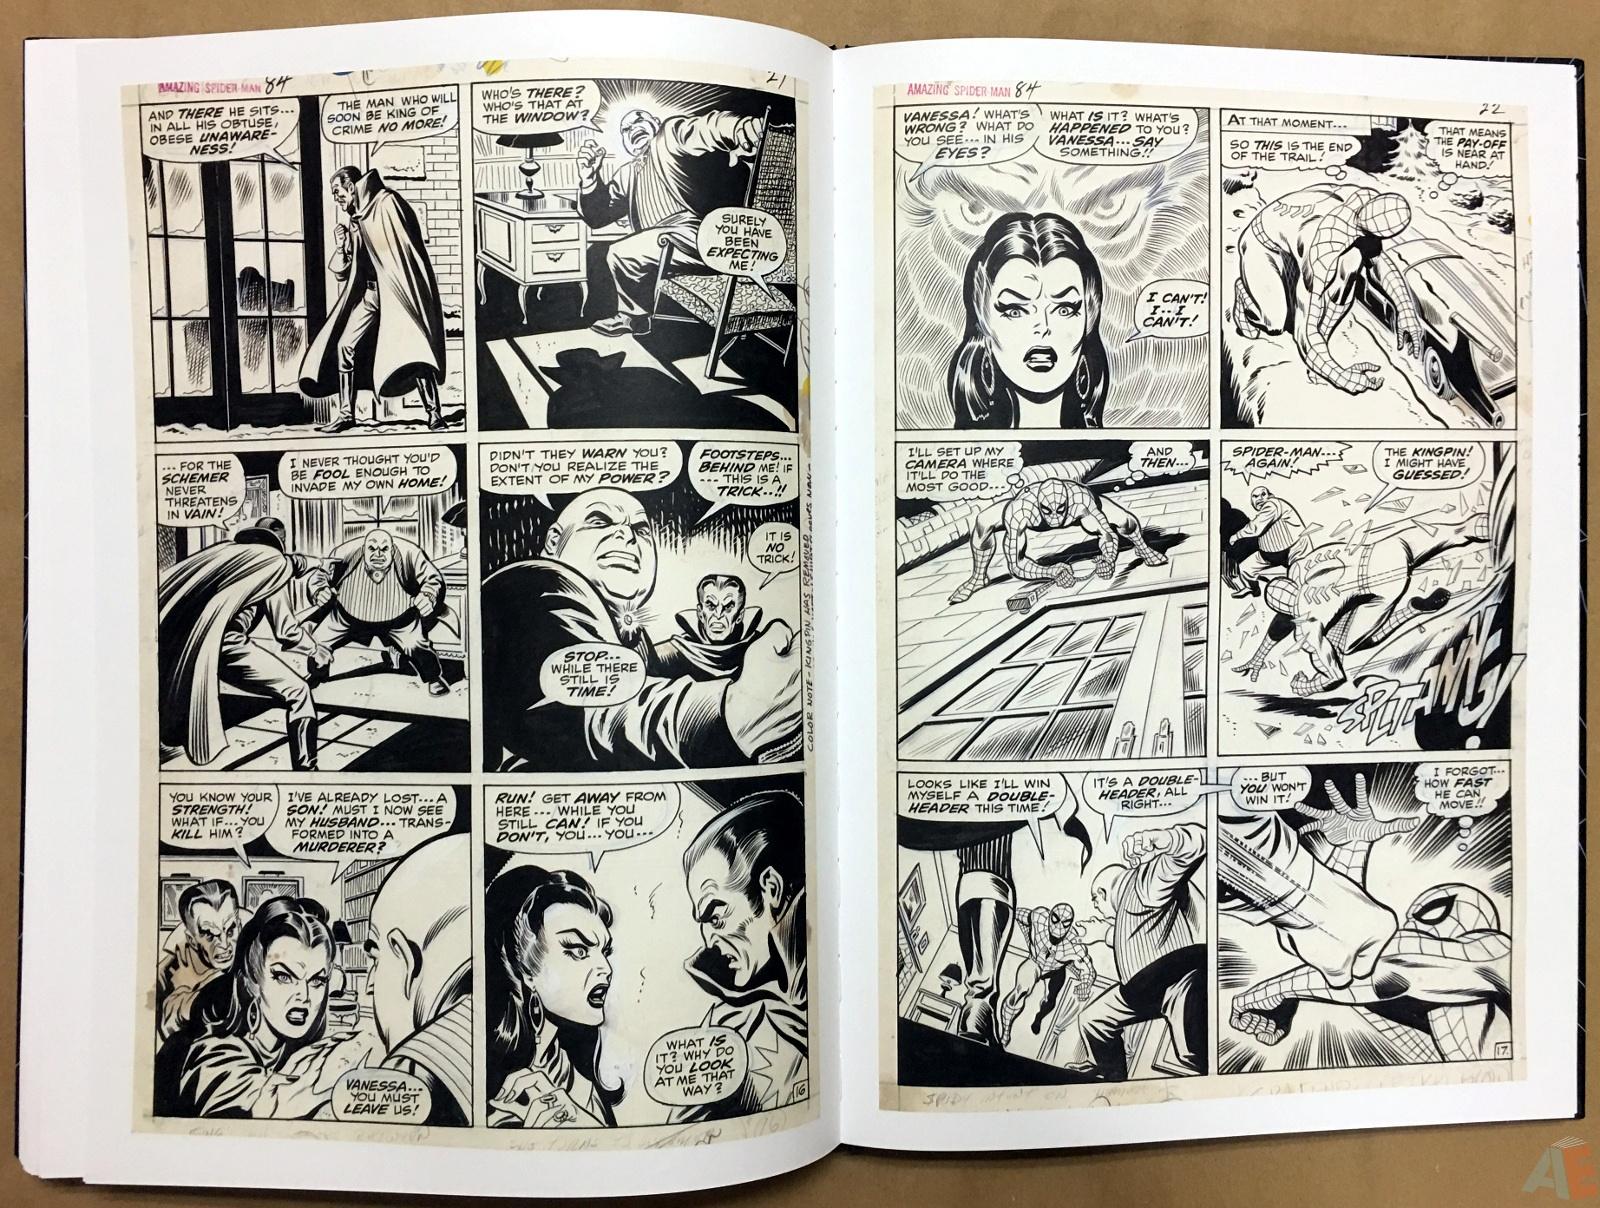 John Romita's The Amazing Spider-Man Artist's Edition 50